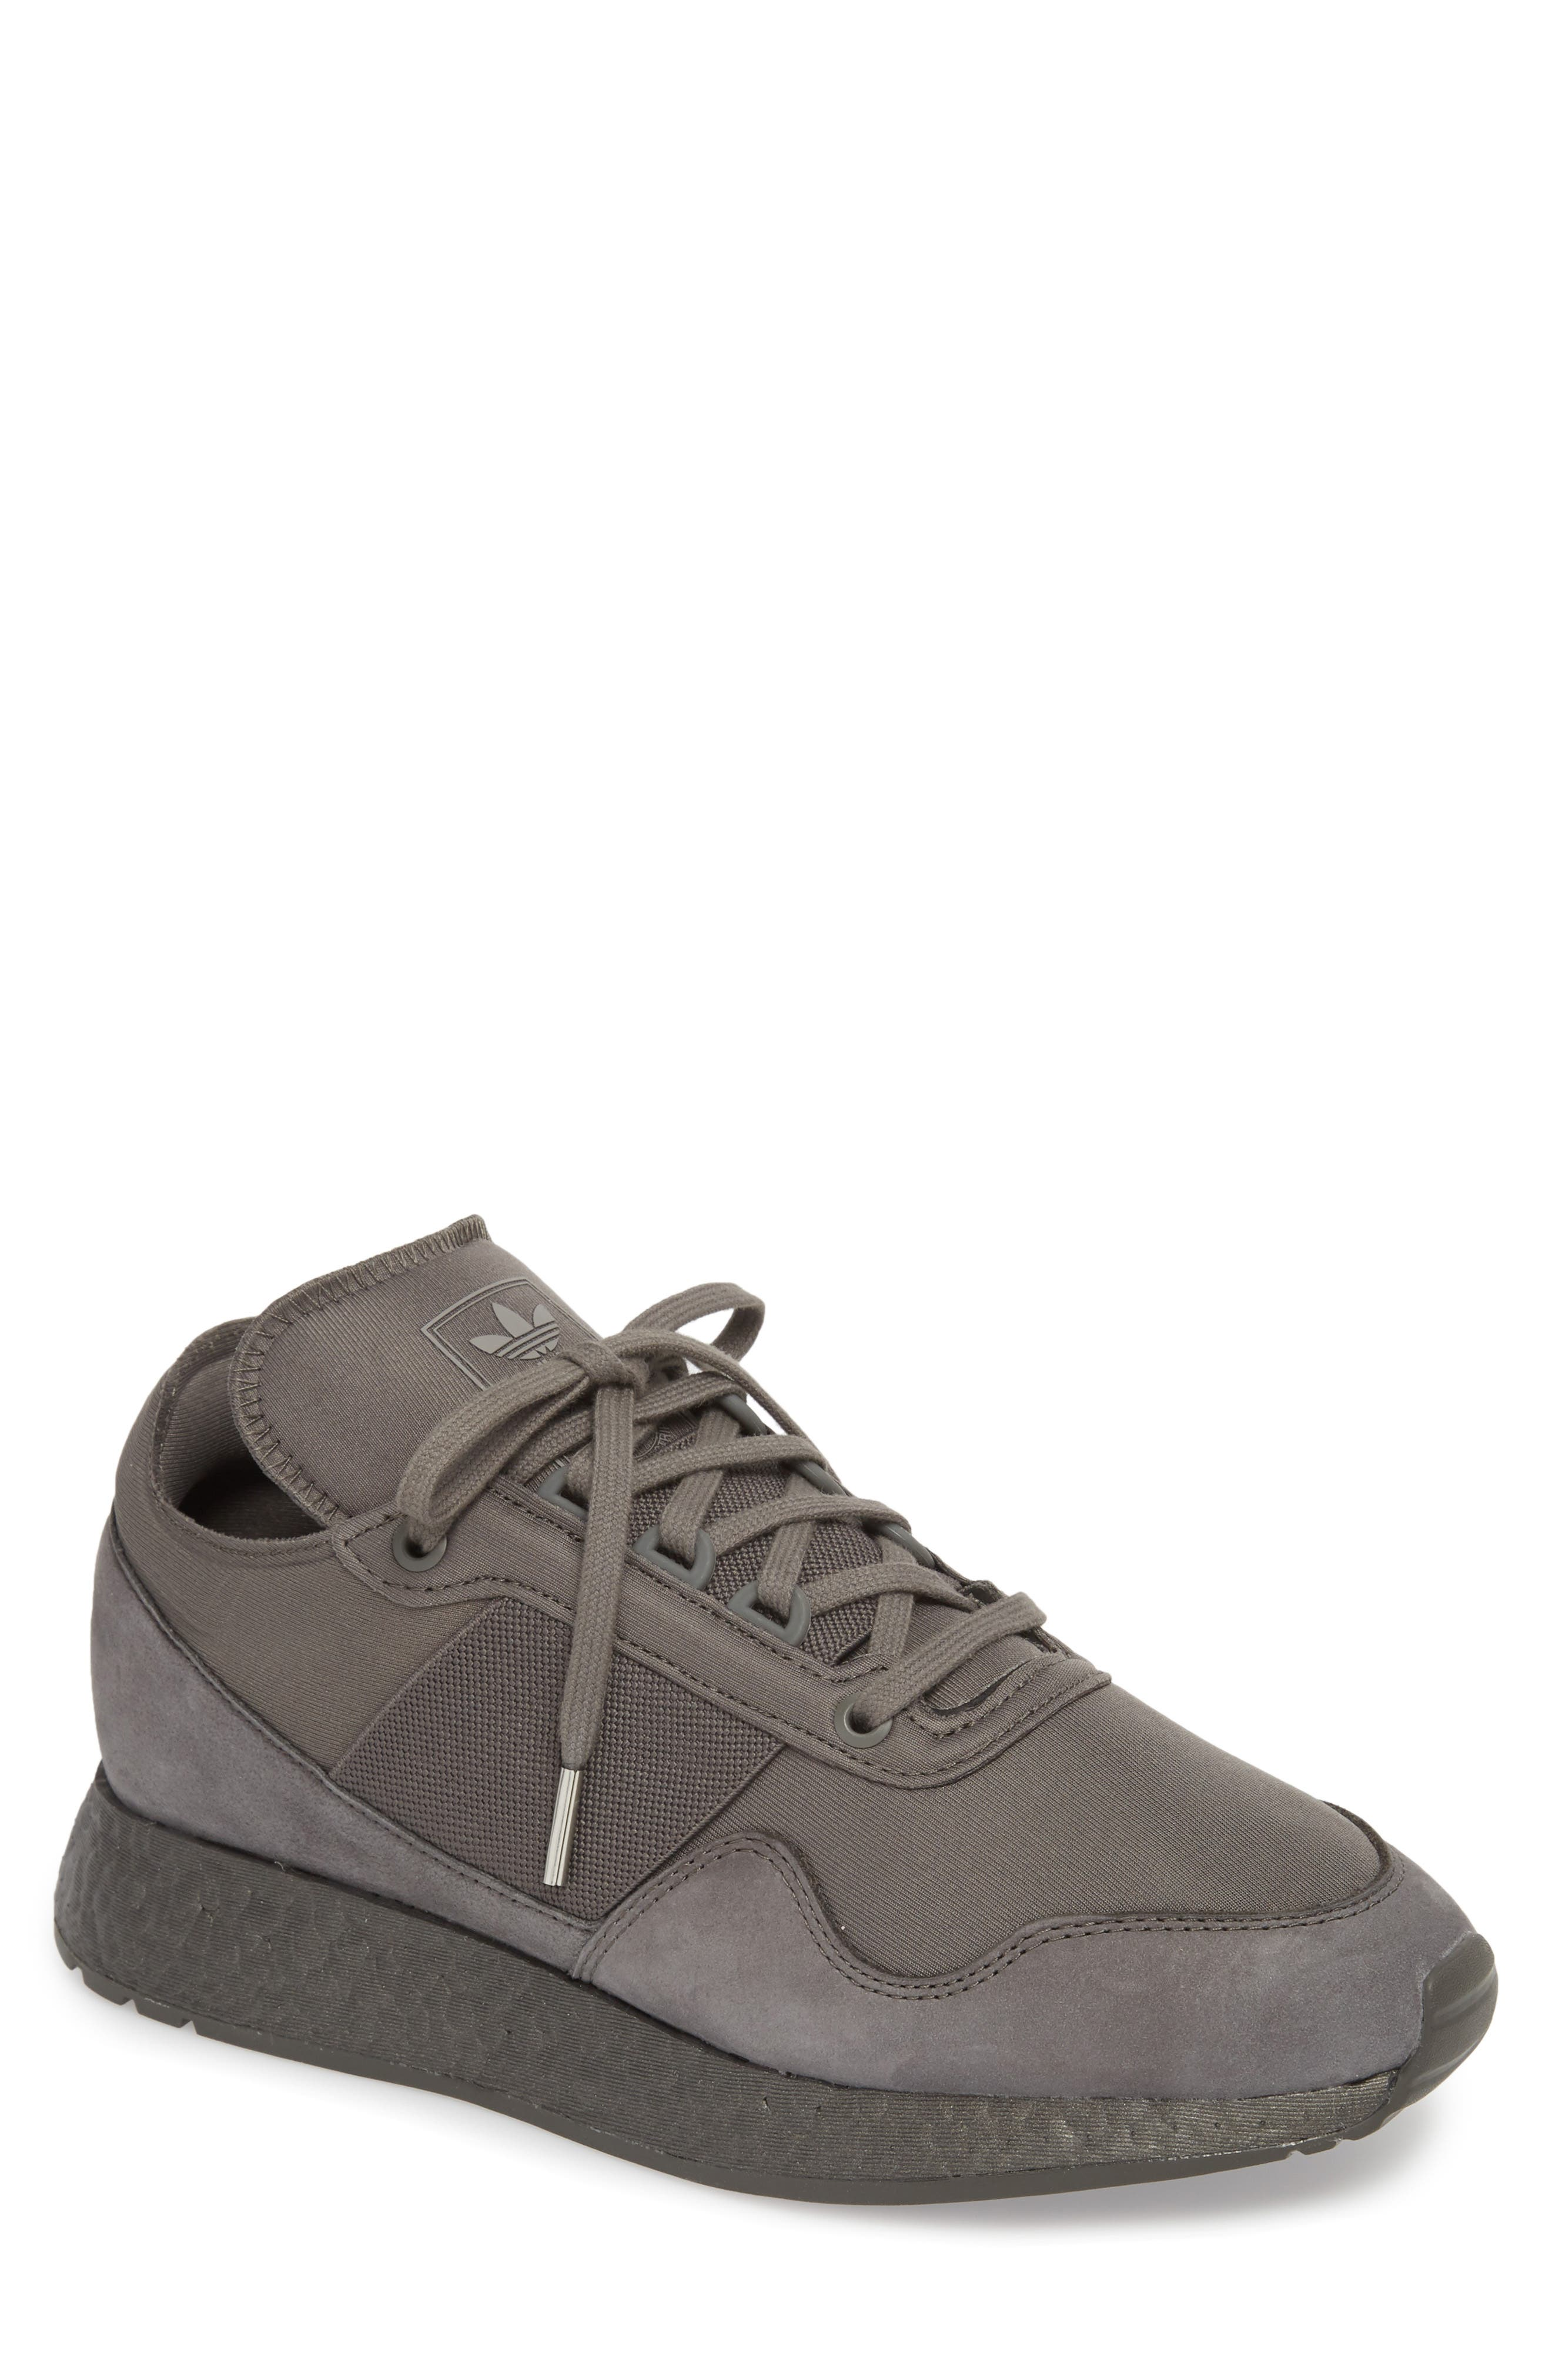 New York Present Arsham Sneaker,                             Main thumbnail 1, color,                             Grey